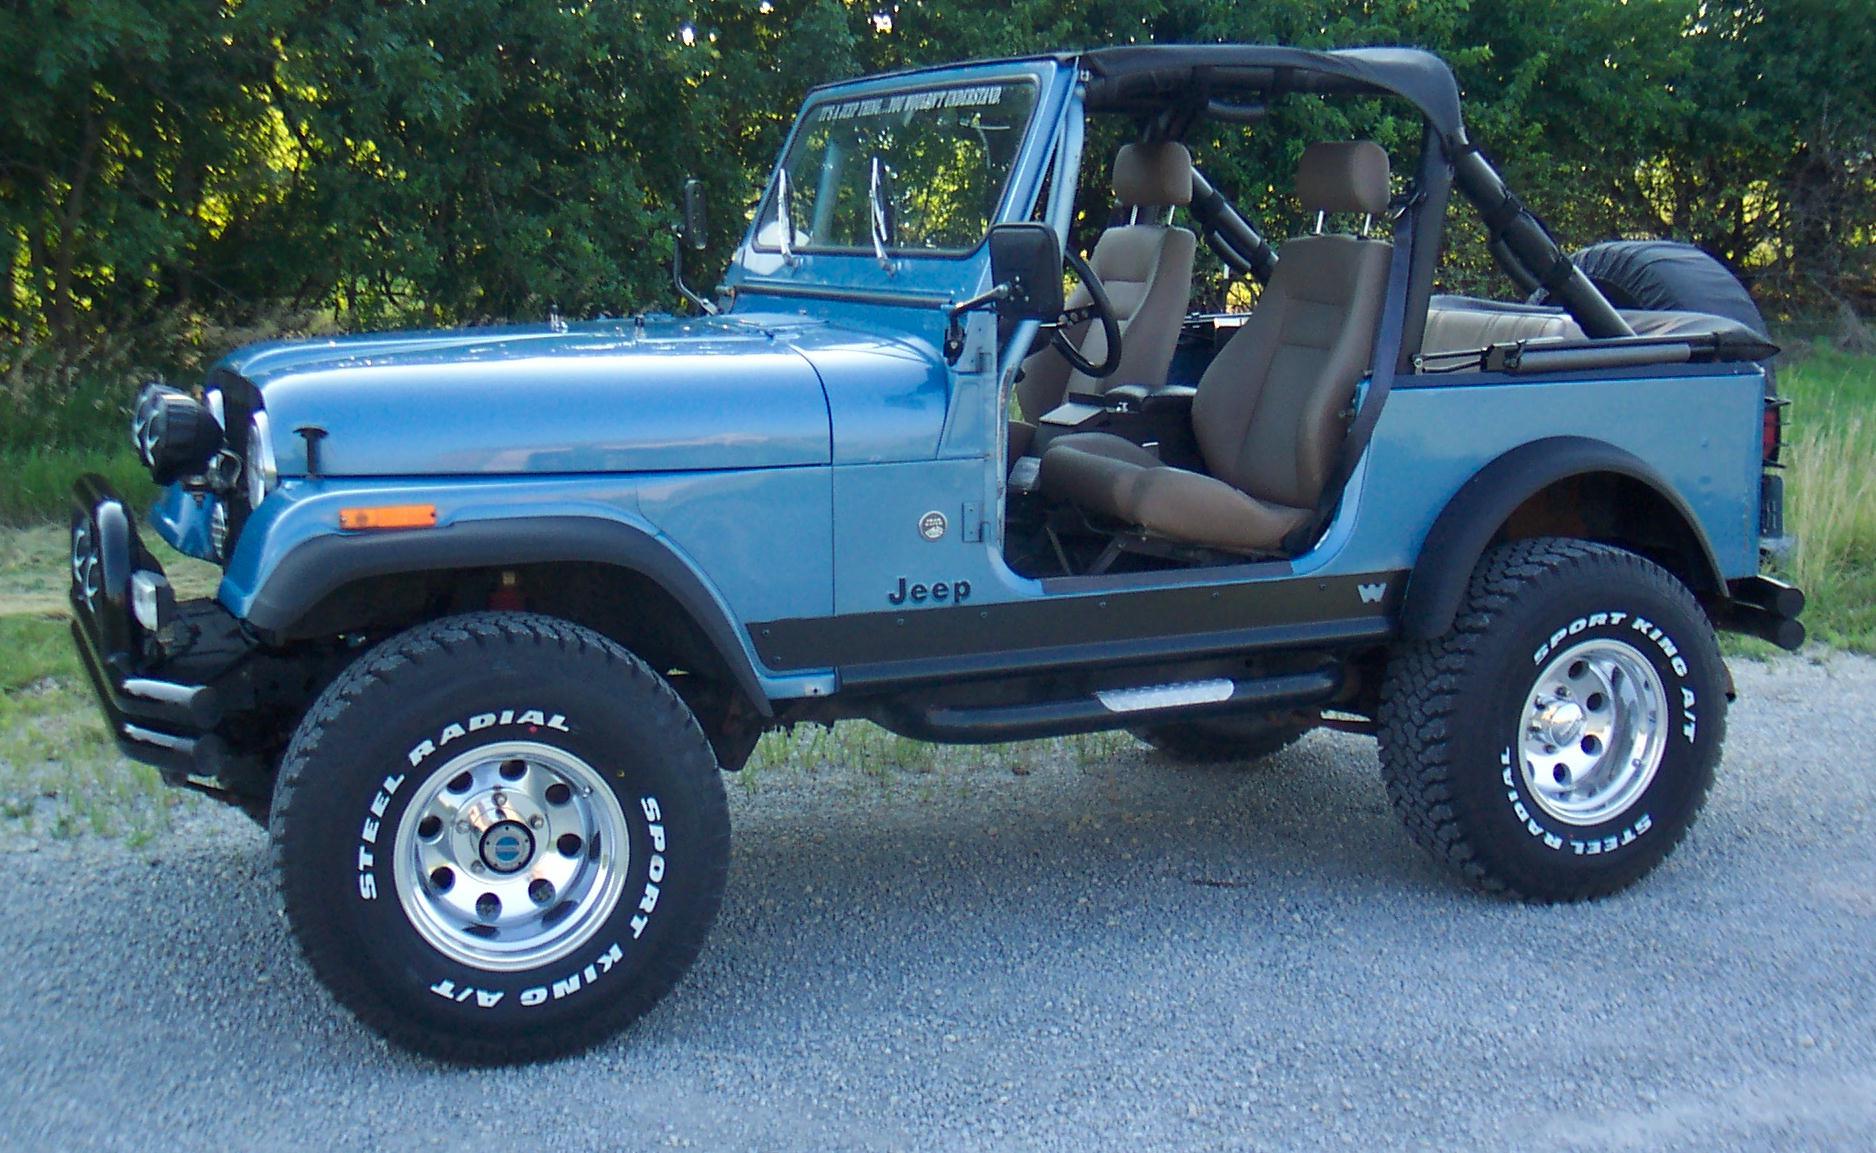 Jeep Cj7 Parts >> Jeep Wrangler CJ-7 technical details, history, photos on Better Parts LTD